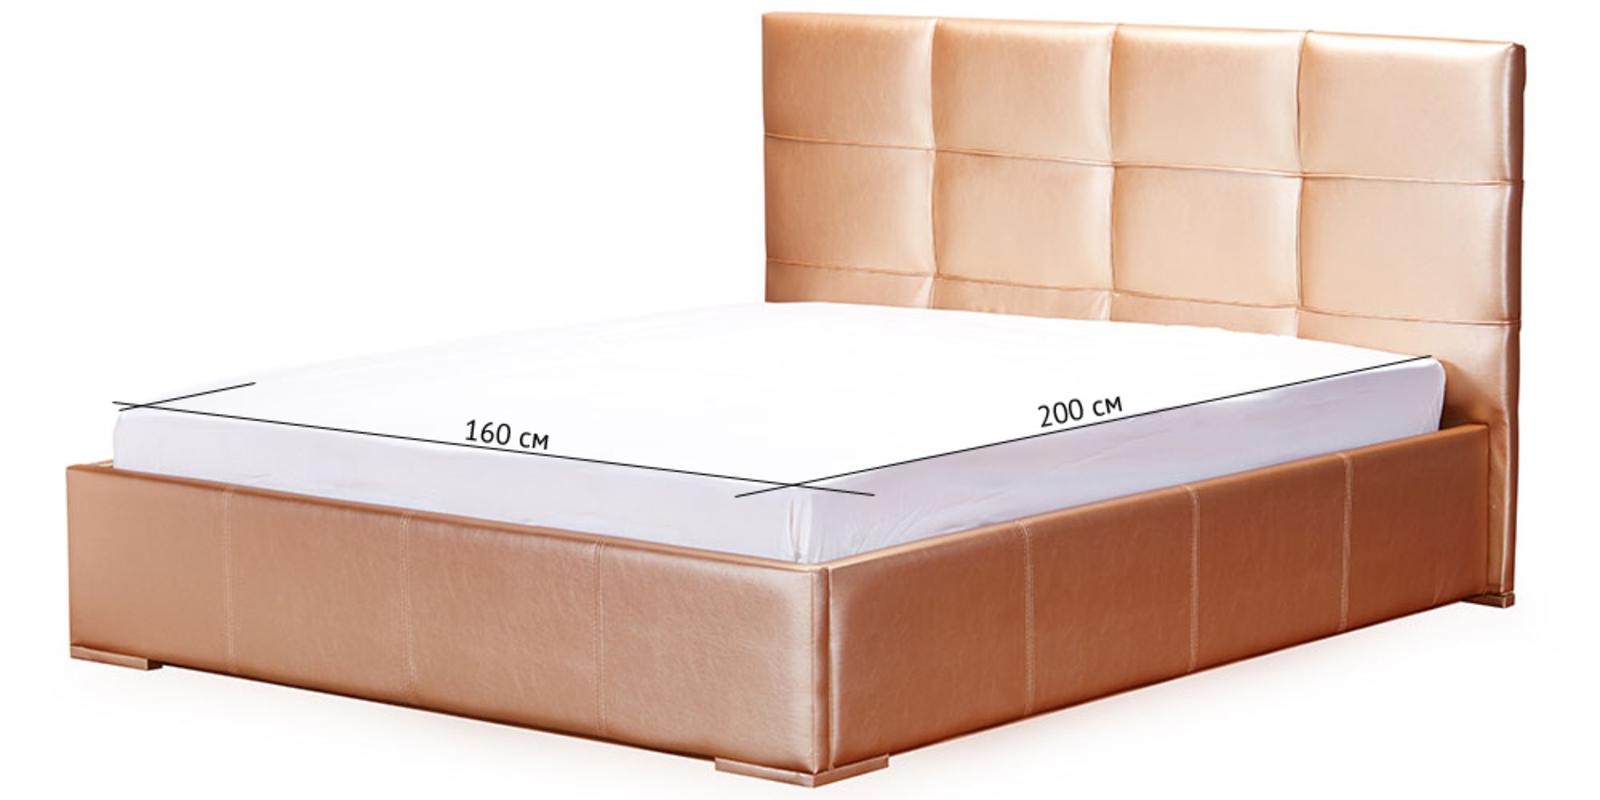 Кровать мягкая Лайф без подъемного механизма (Золото) от HomeMe.ru